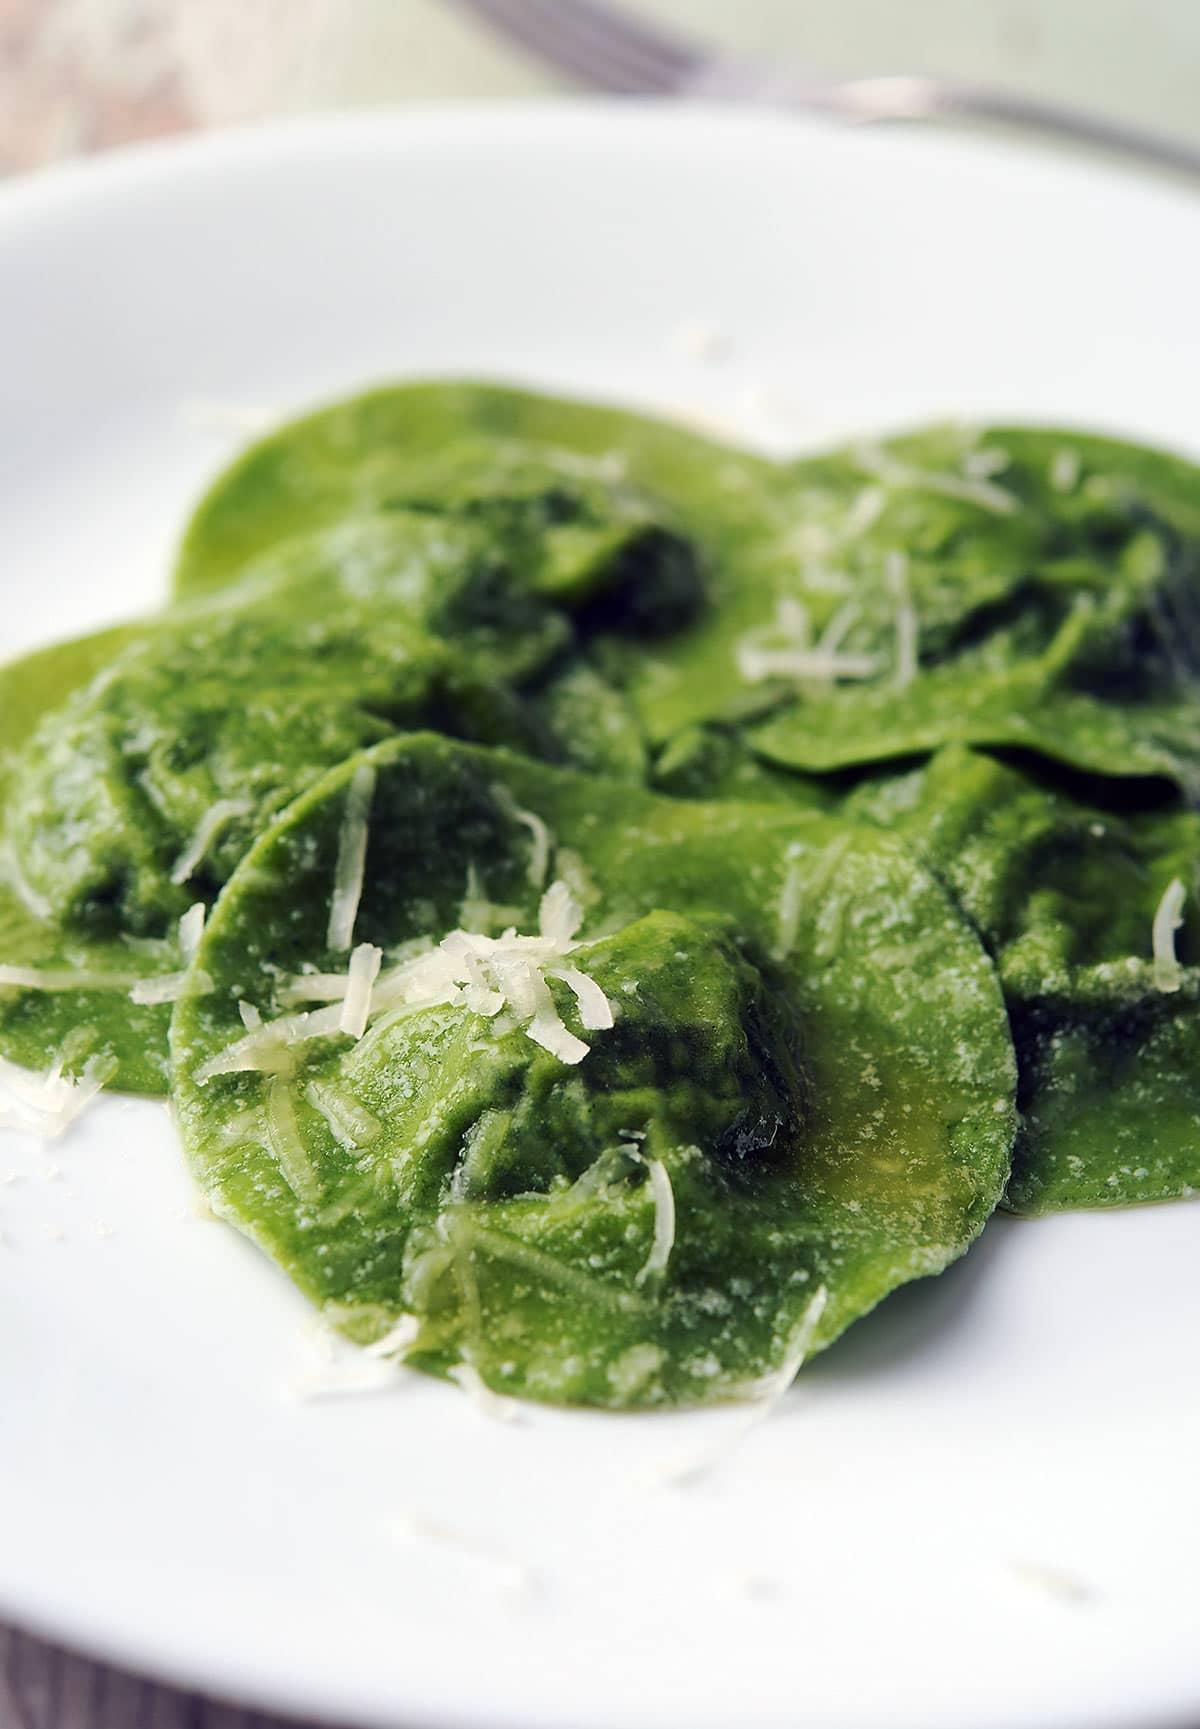 Nettle ravioli on a plate